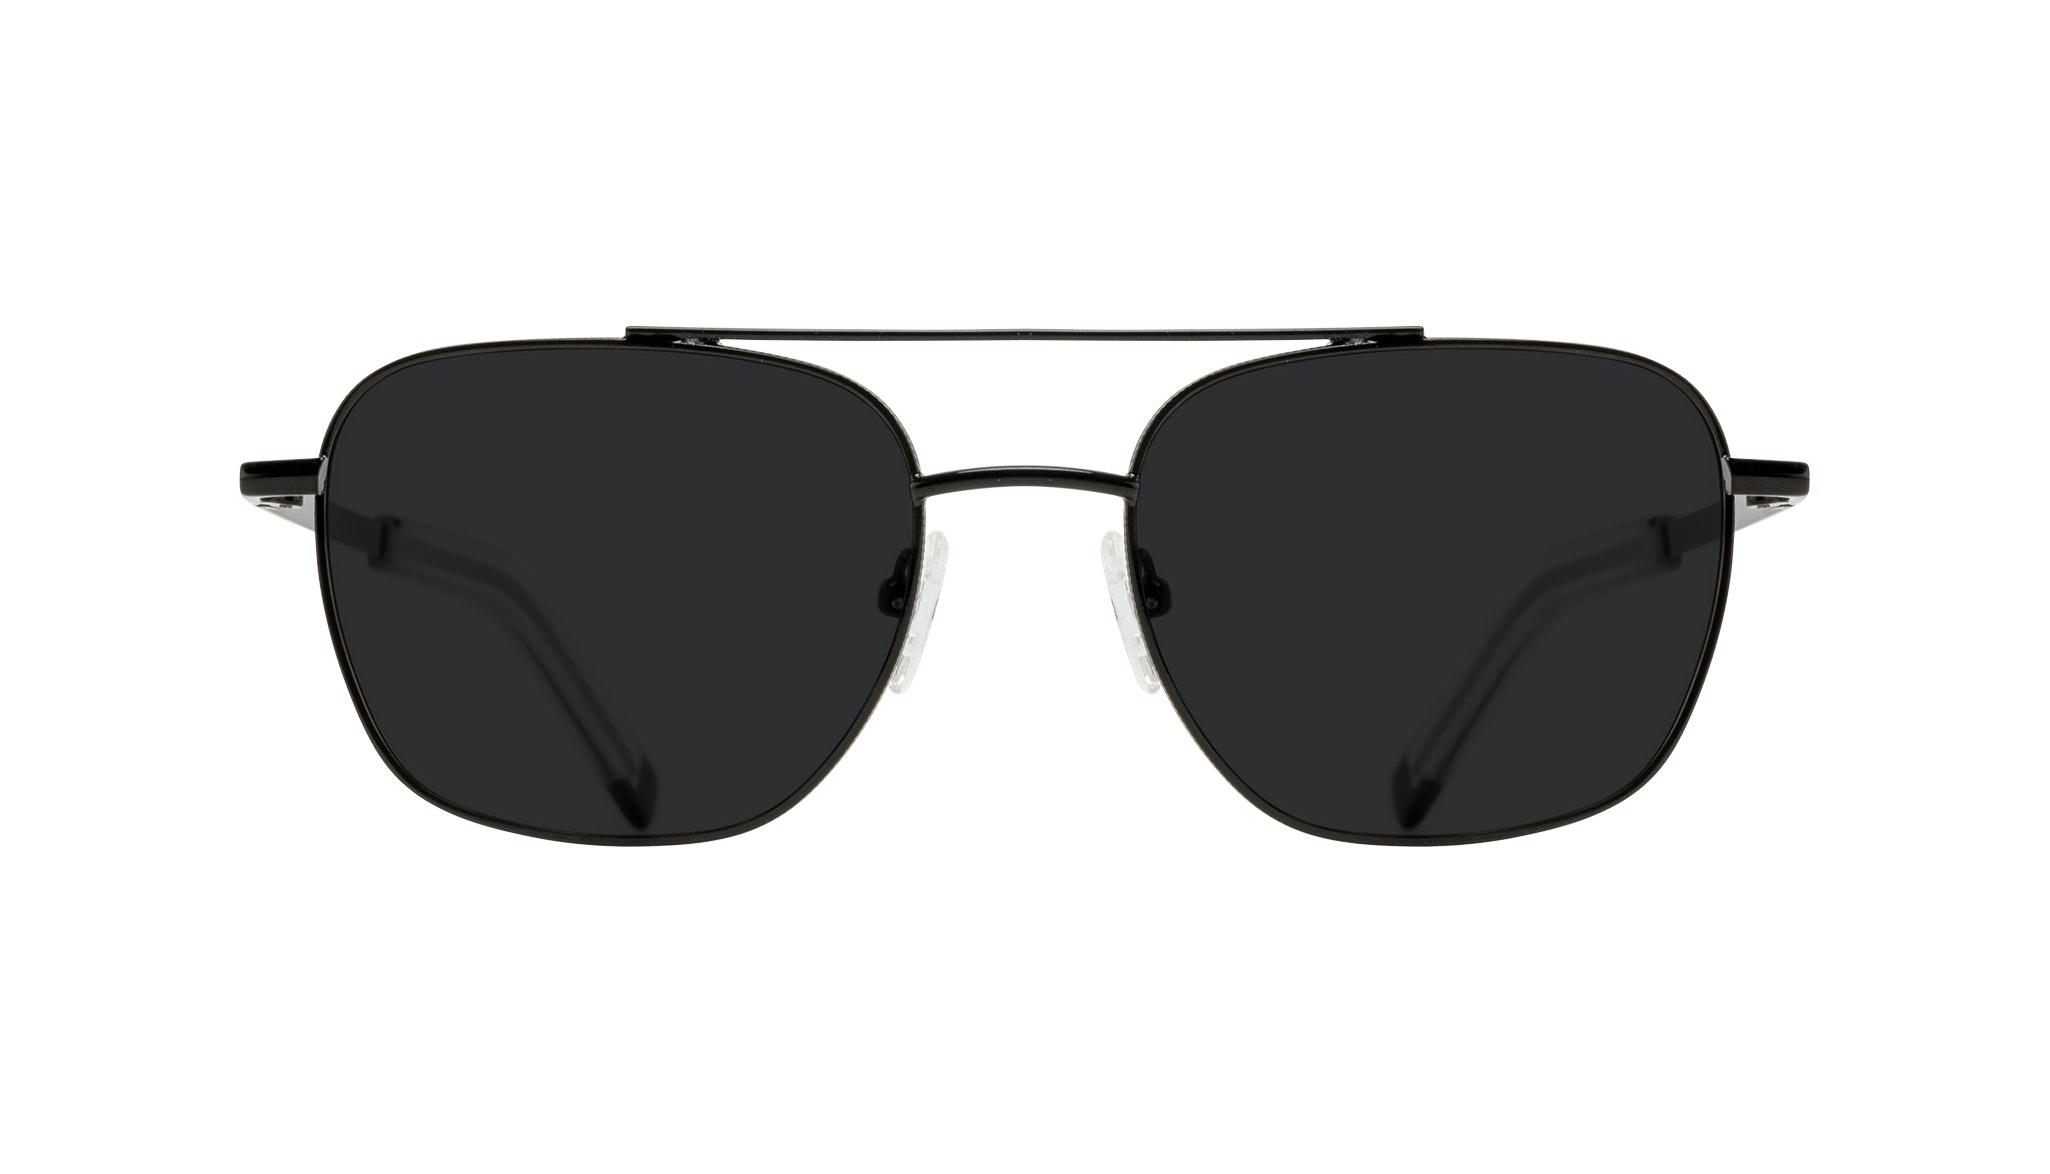 Affordable Fashion Glasses Aviator Sunglasses Men Drift Black Front